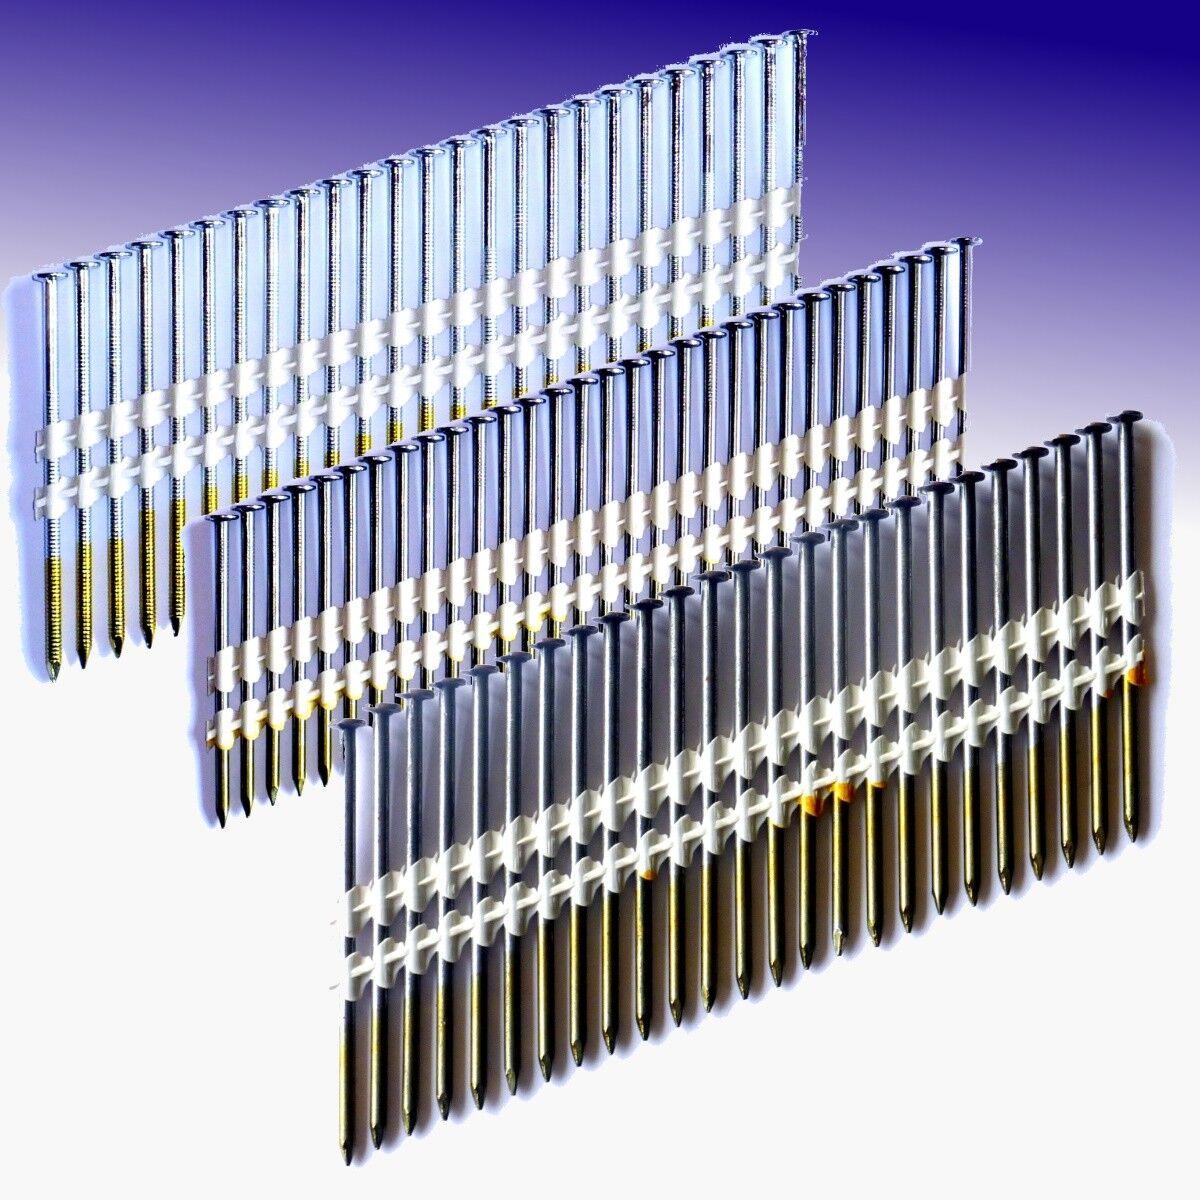 20° PE-Streifennägel (50, 65, 70, 80, 90 mm, verzinkt, gerillt, glatt, blank)